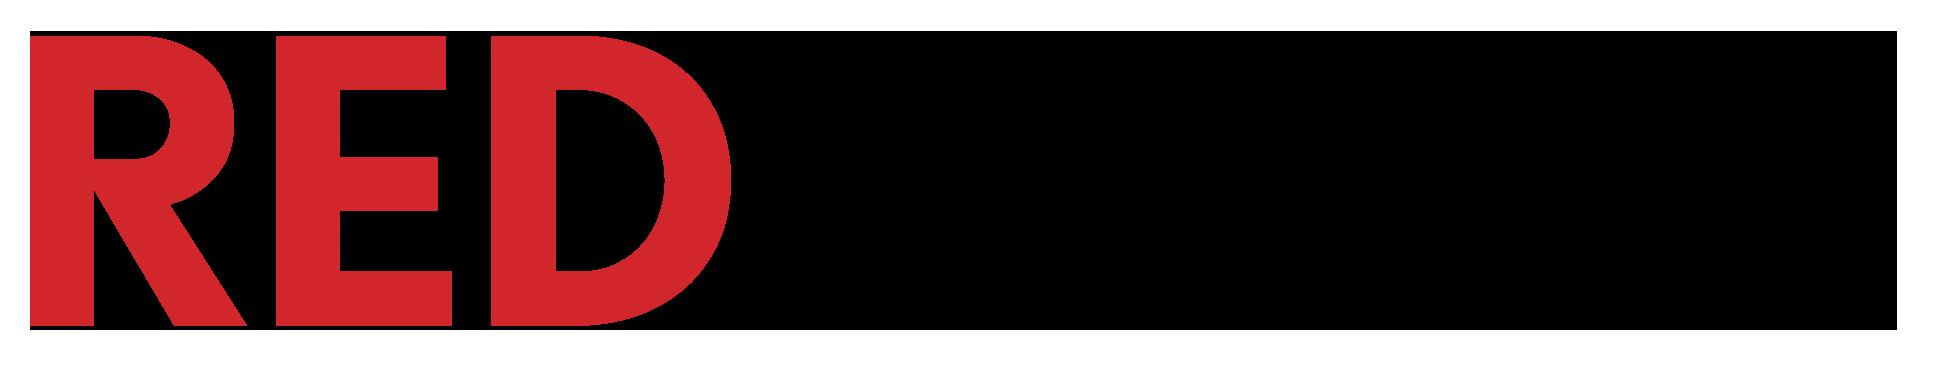 Red Giant PluralEyes 4.1.1 RG_web_on_white